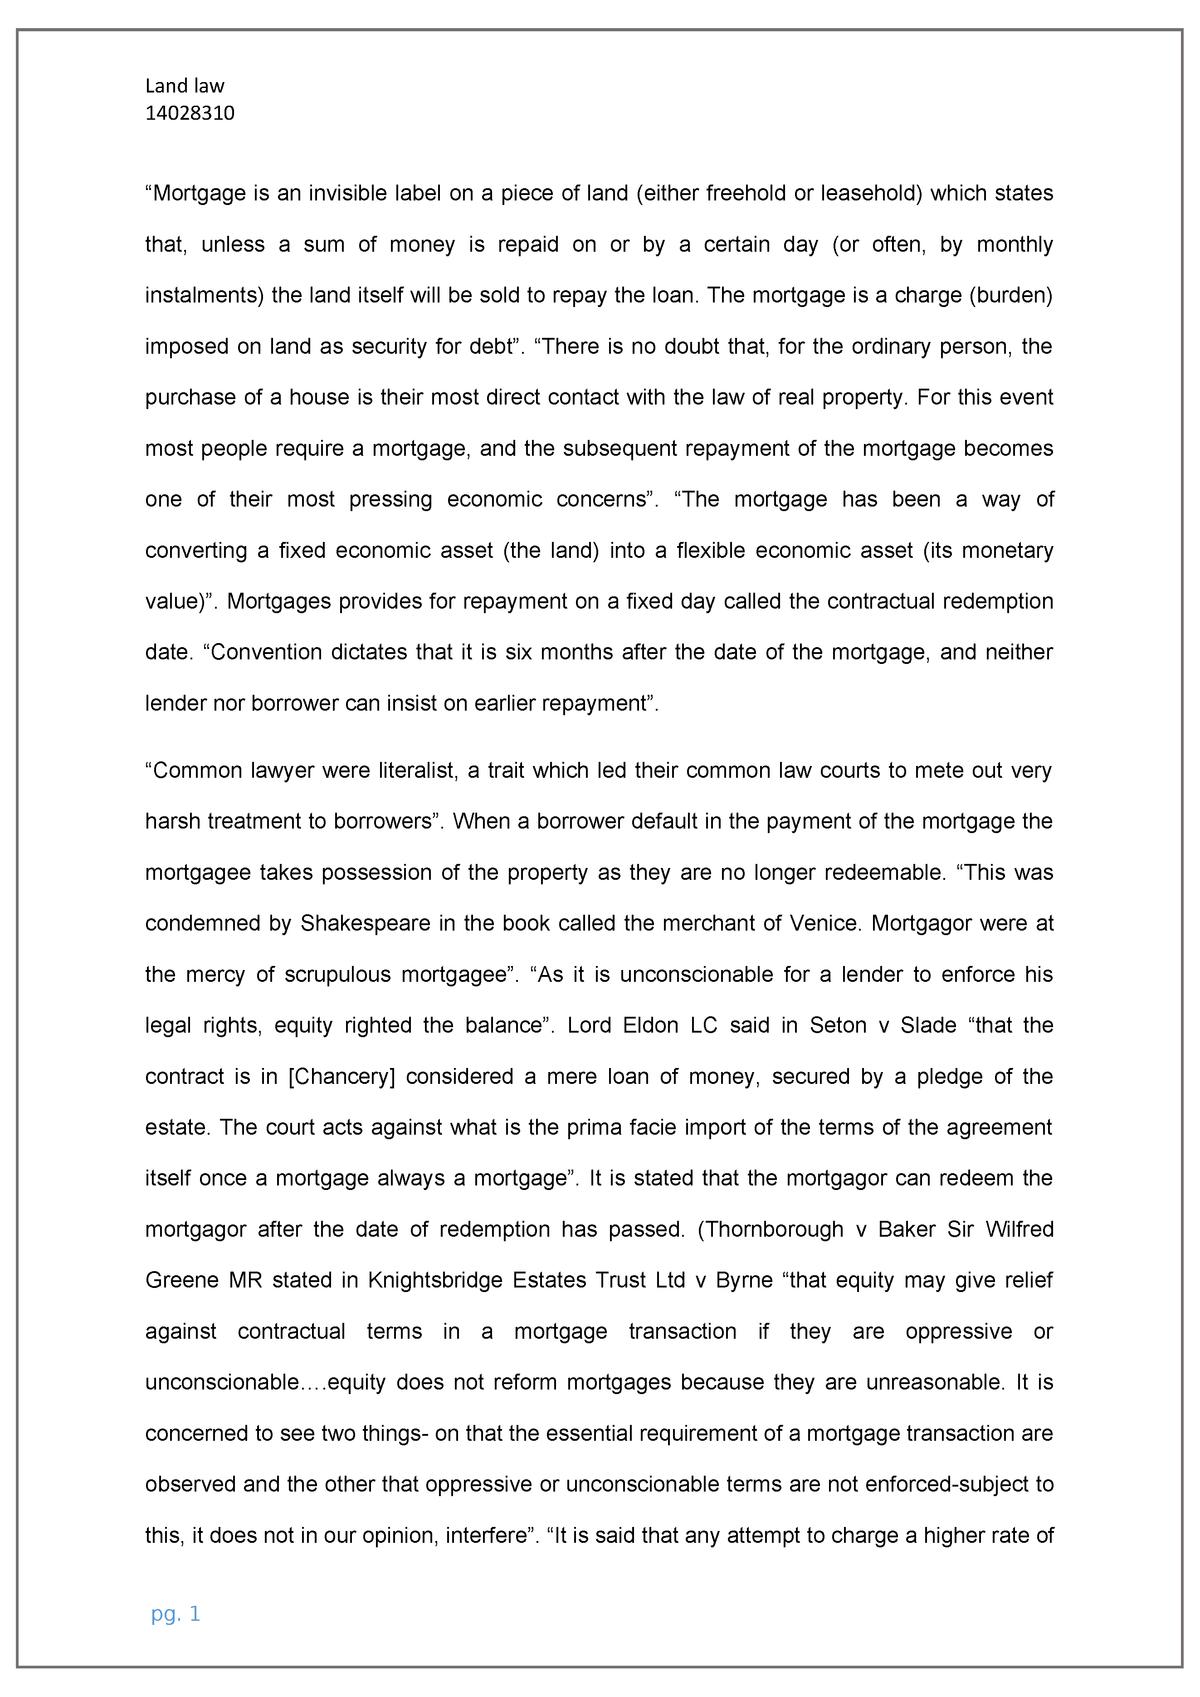 Dissertation help chapter test